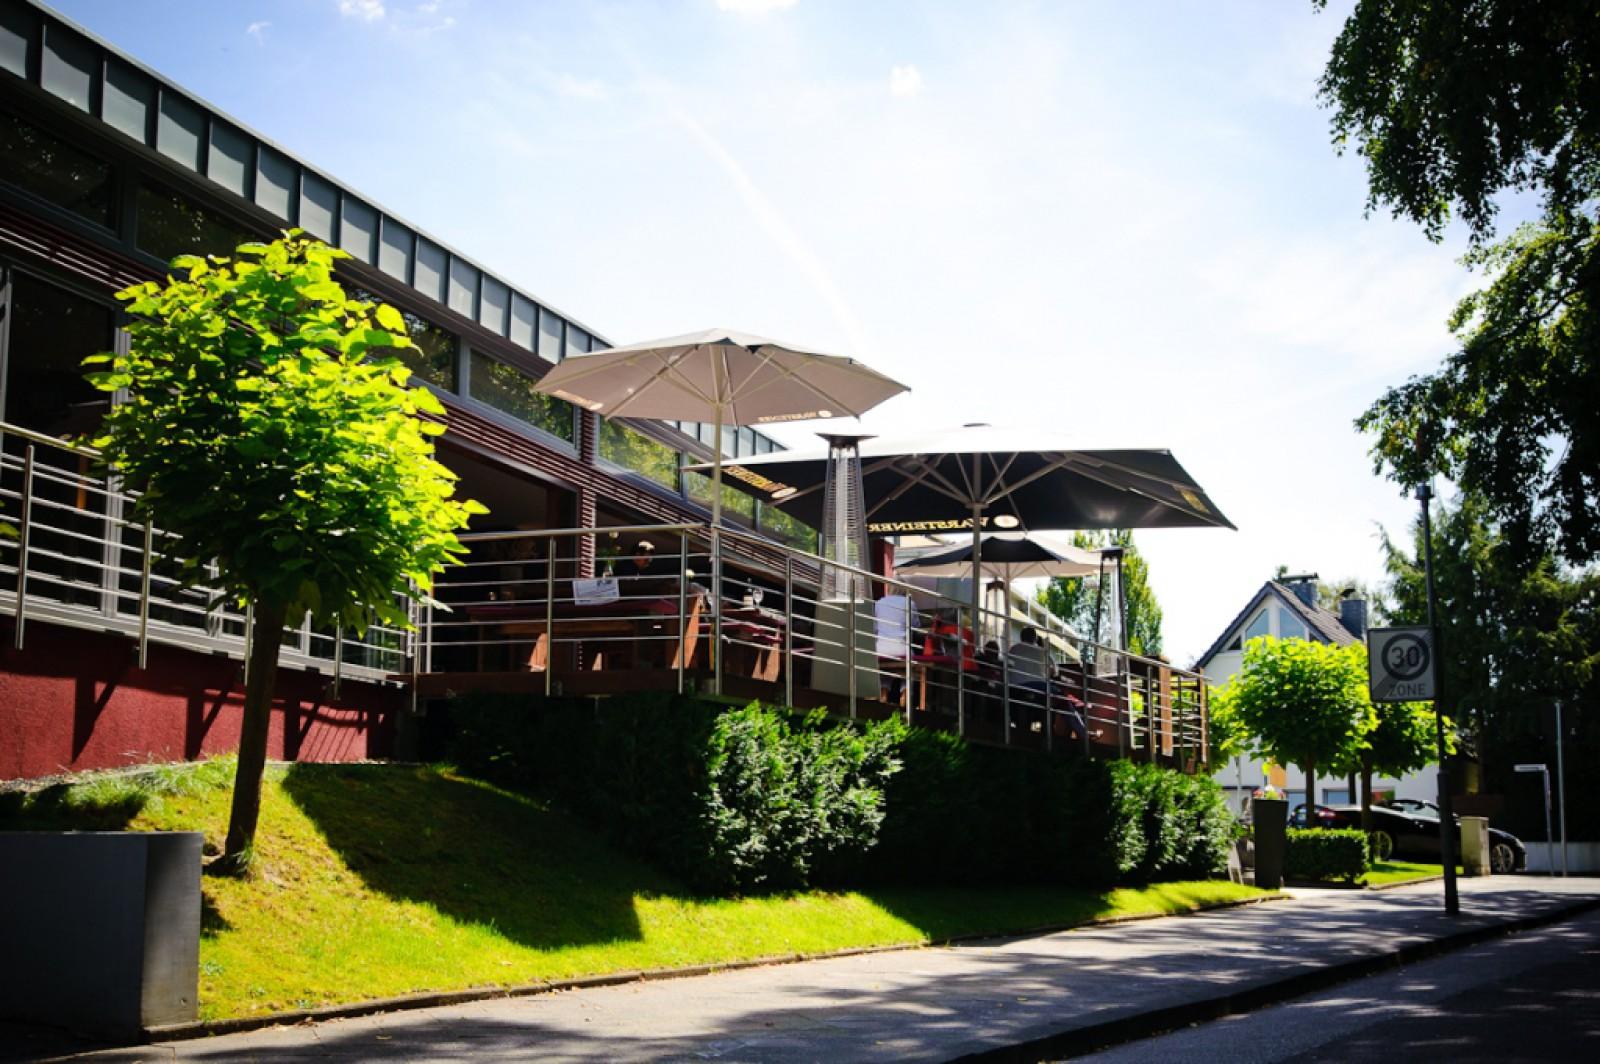 Casino Mönchengladbach